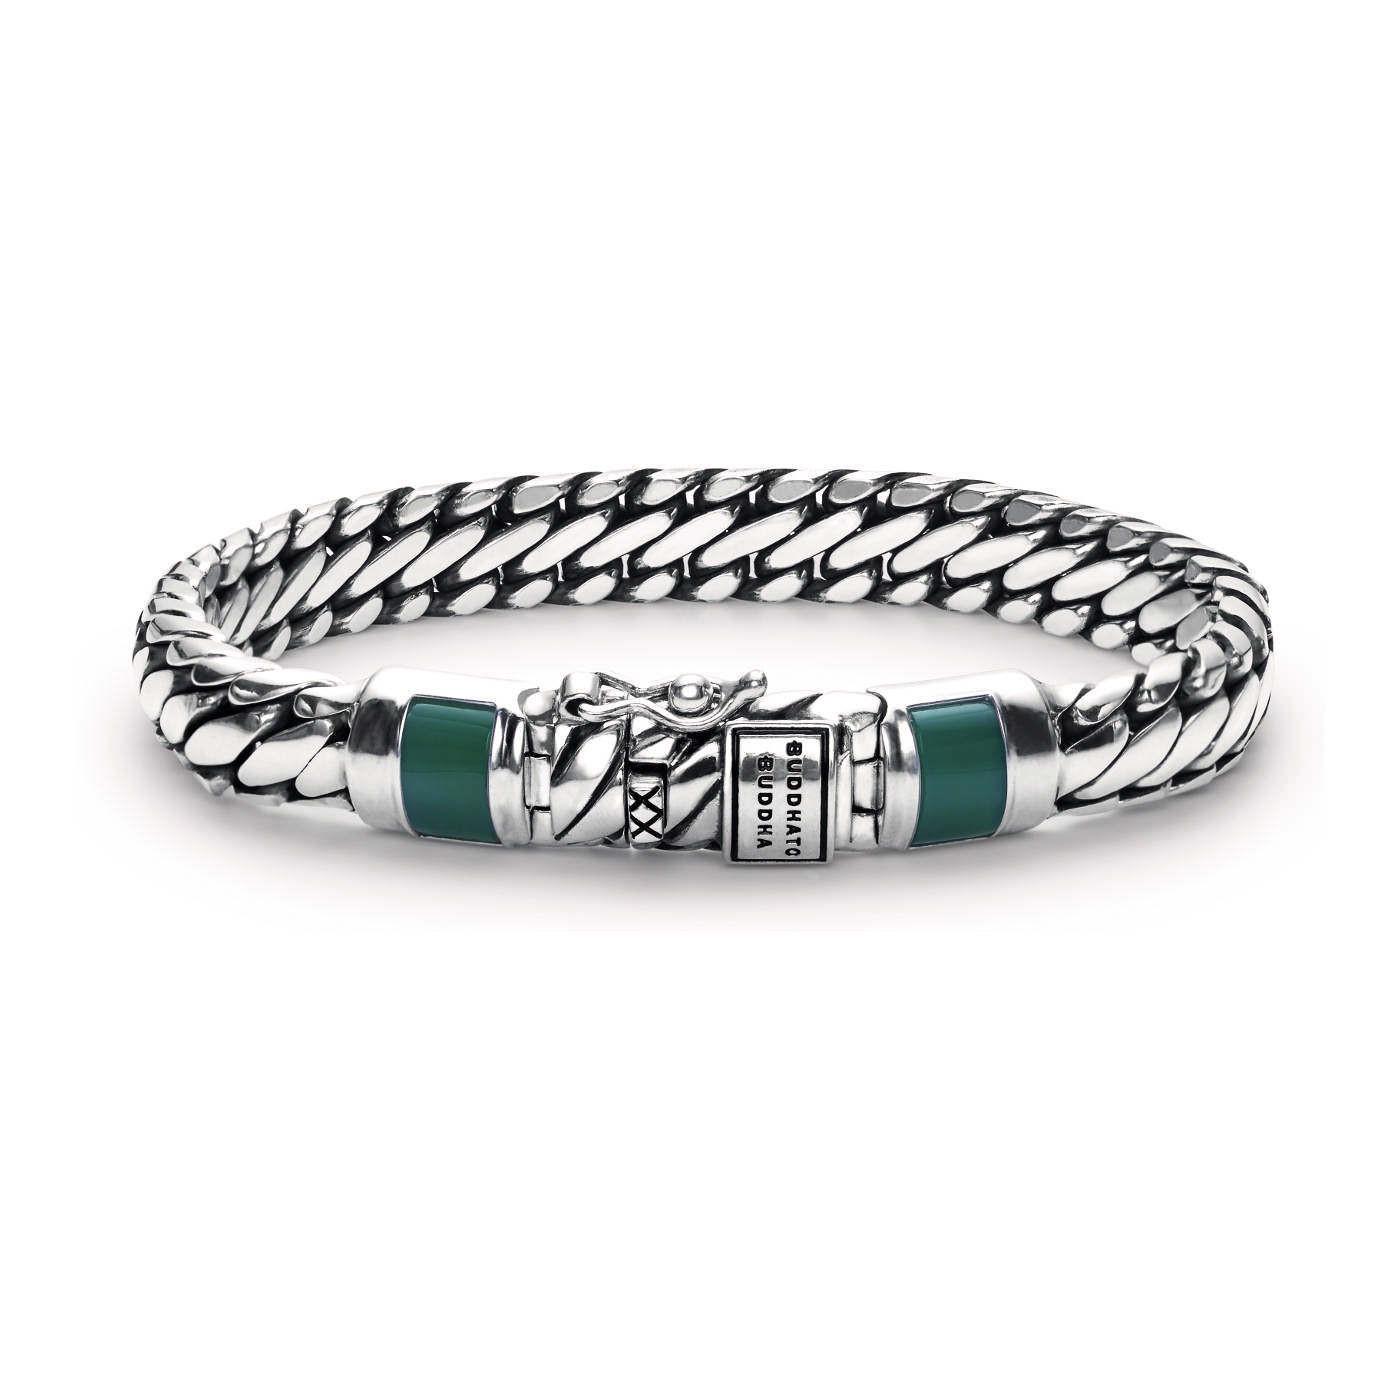 Buddha to Buddha Ben XS Stone Green Chalcedony Armband J070GR (Lengte: 18-19 cm)